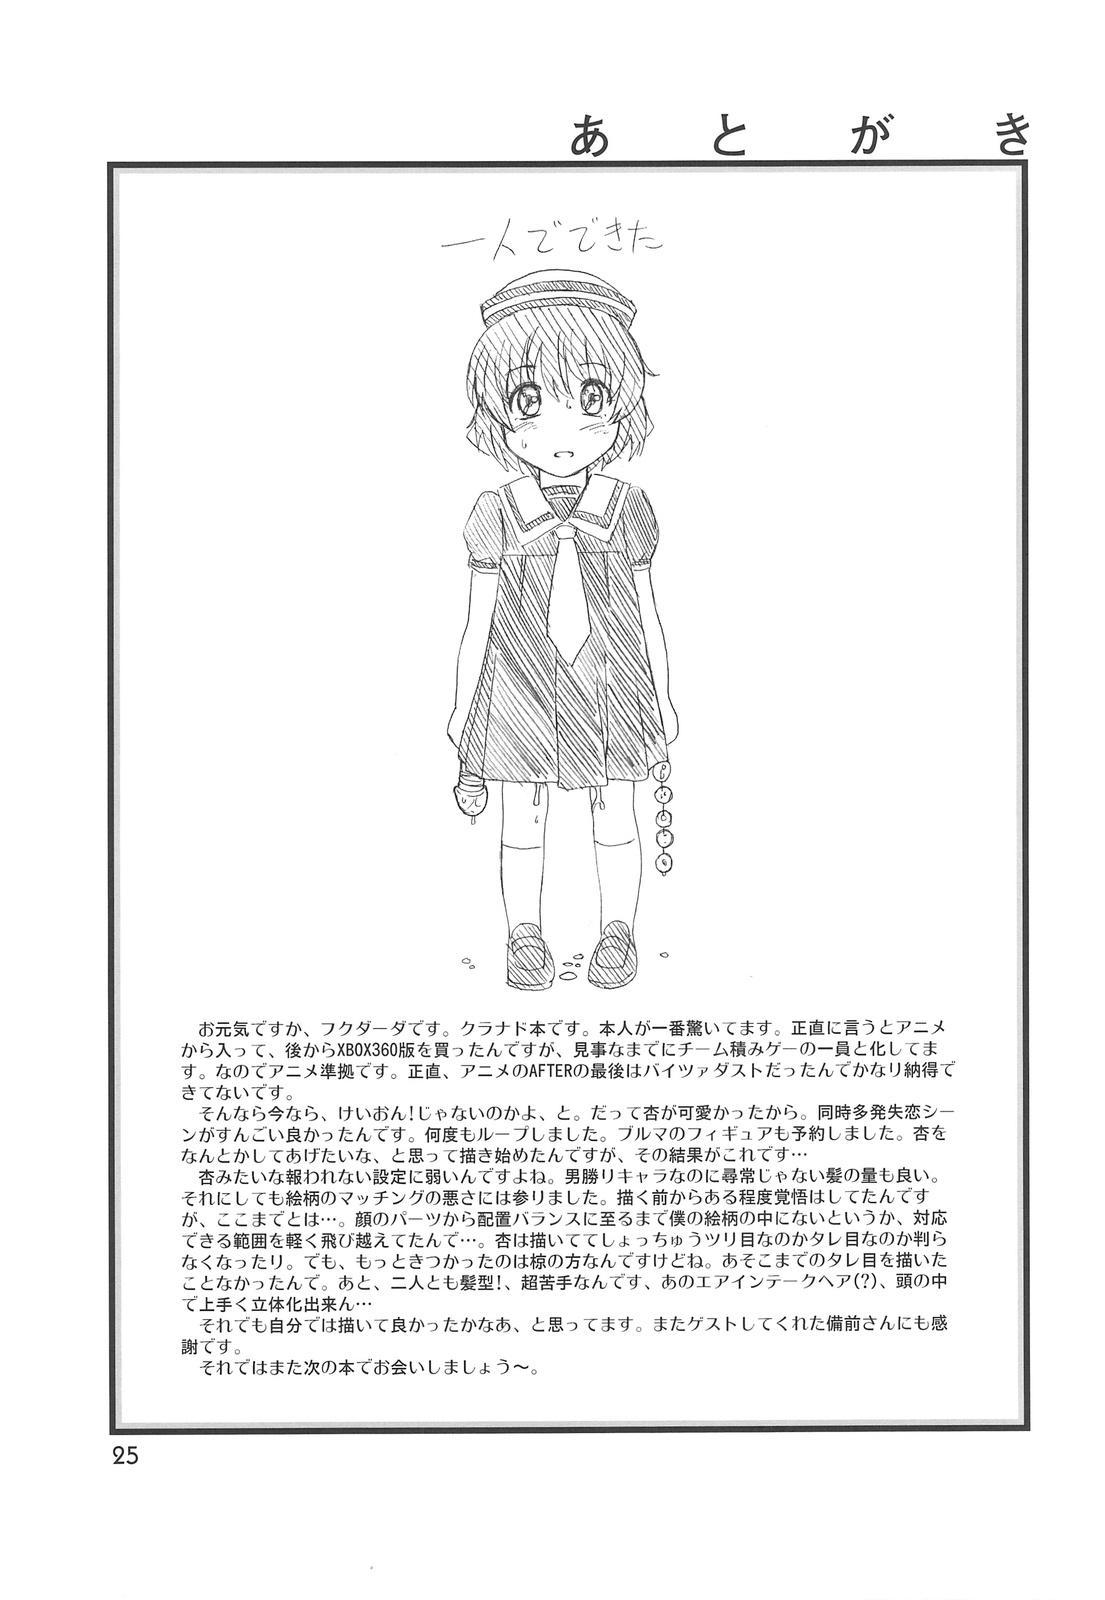 Fujibayashi Nado - Fujibayashi Twins After Story 23